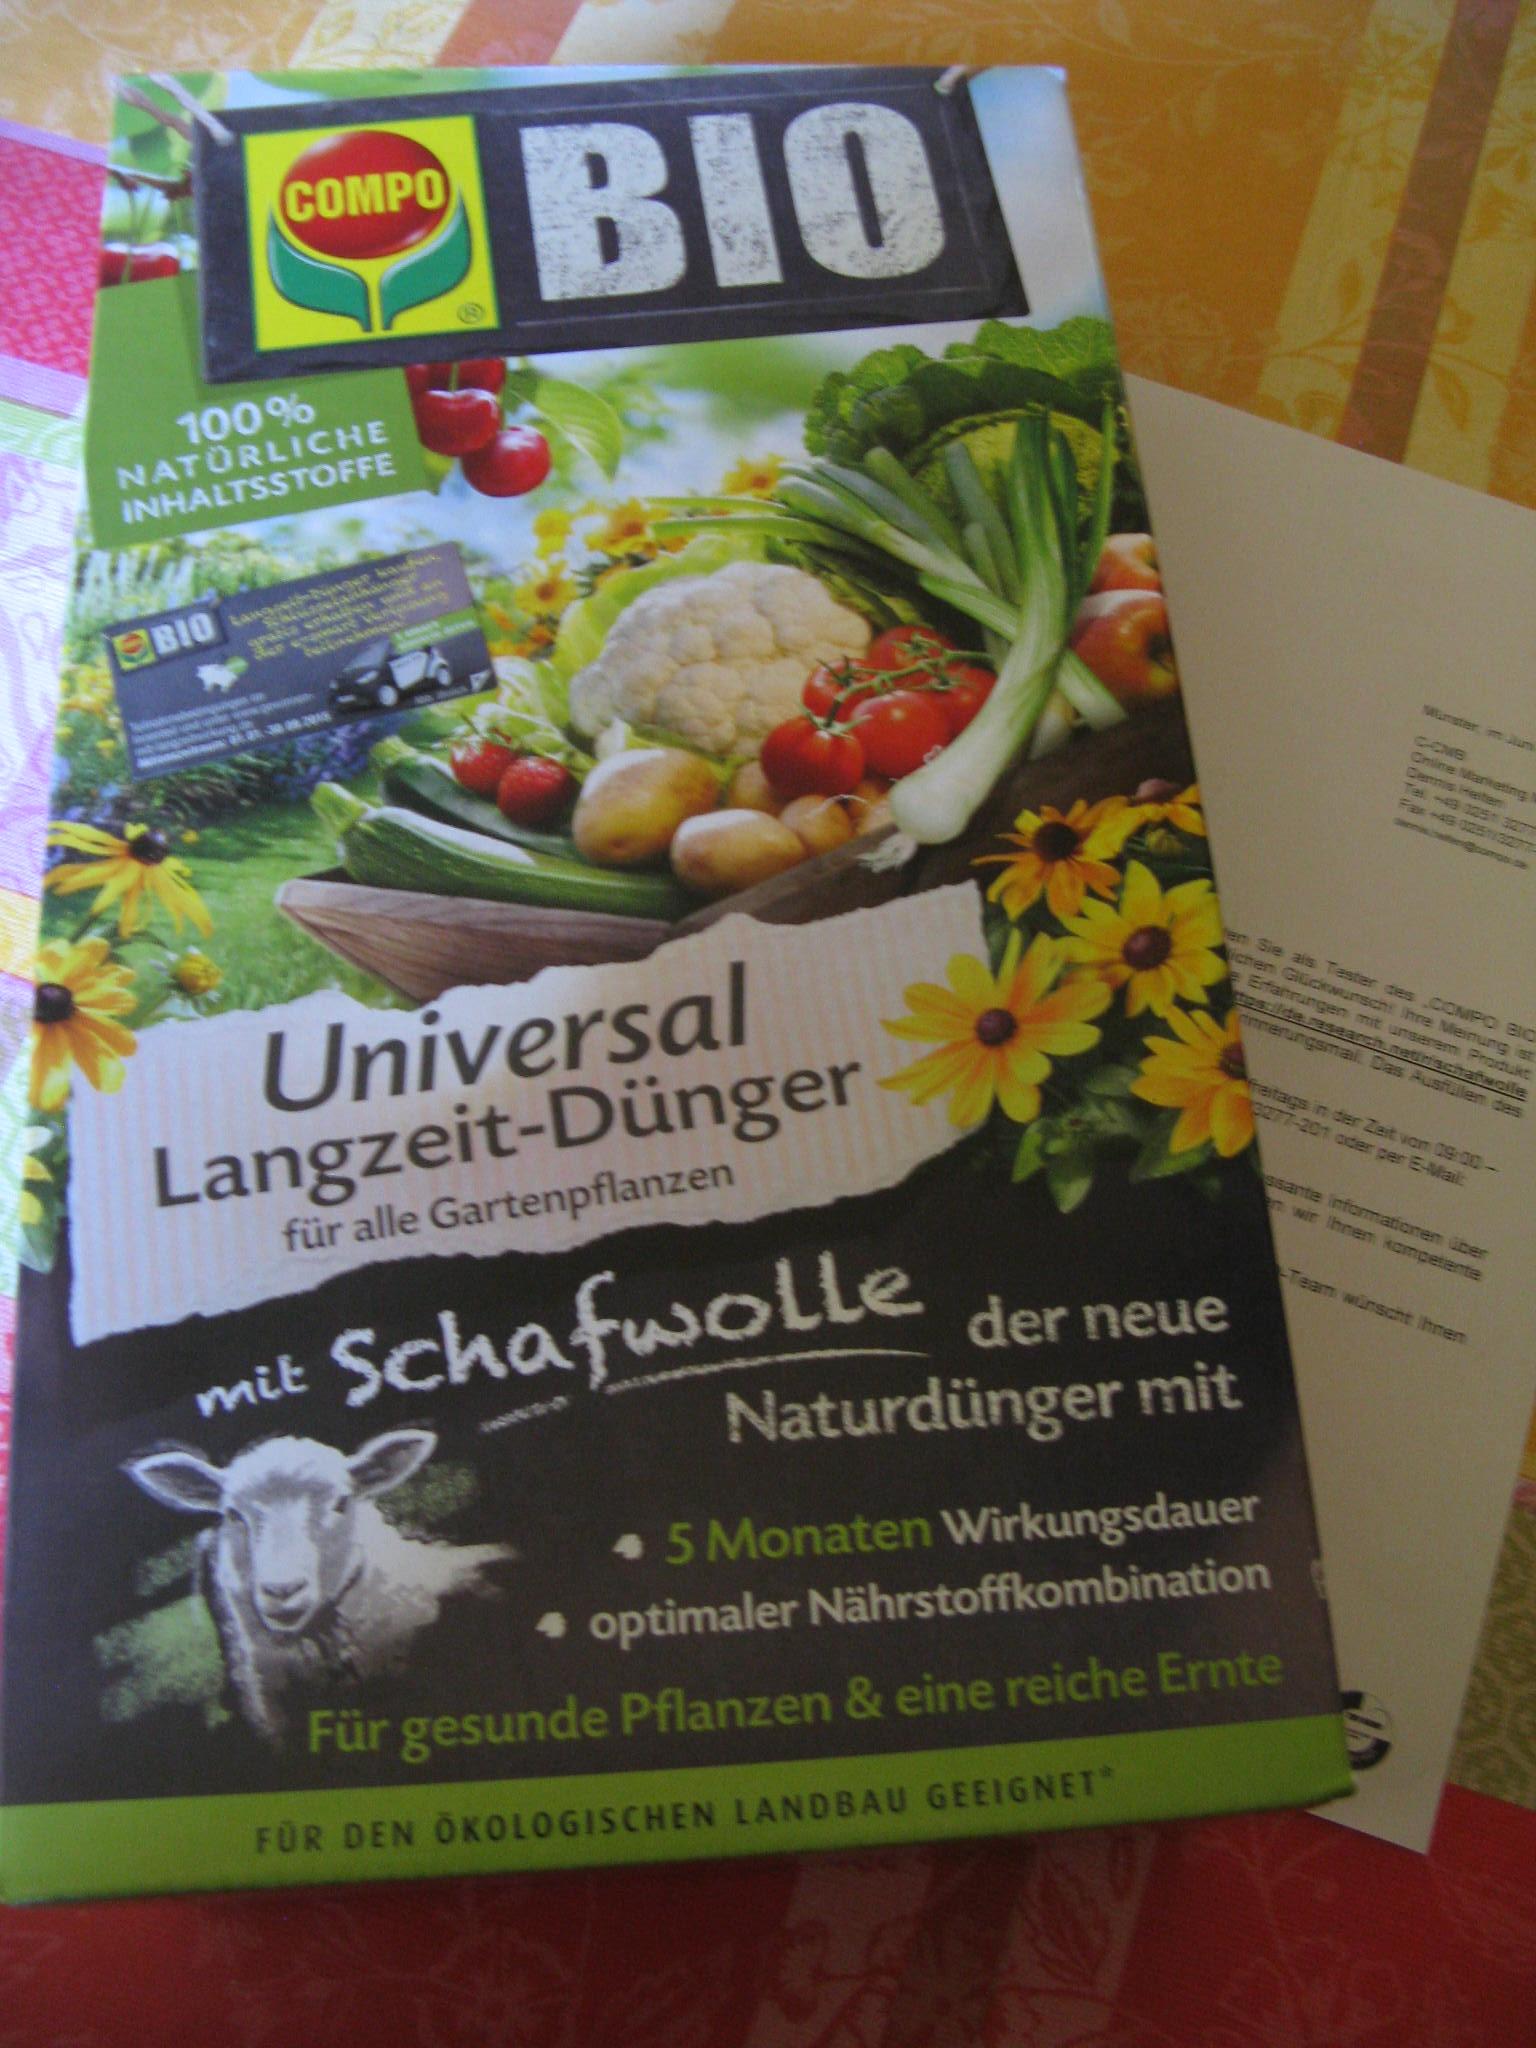 Compo Bio Universal Langzeit- Dünger